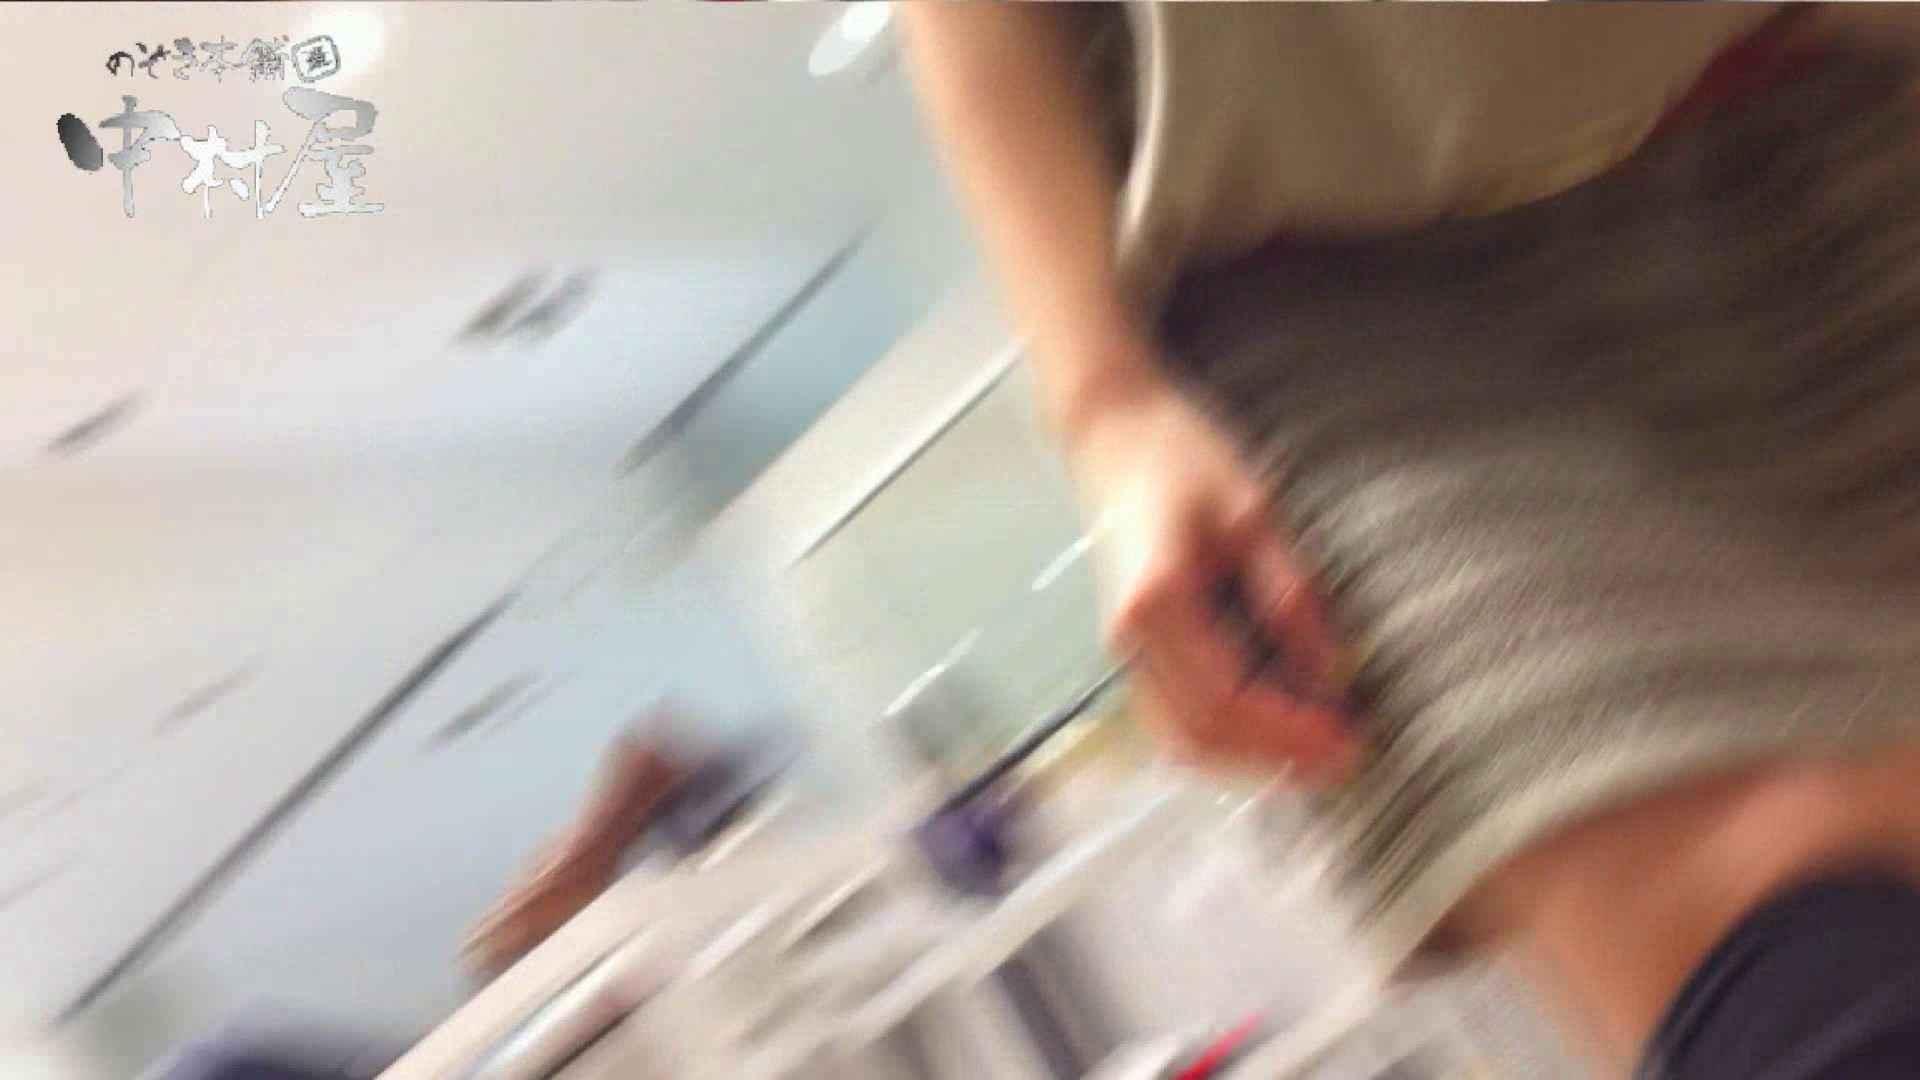 vol.52 美人アパレル胸チラ&パンチラ おとなしそうな店員の胸元にアタック! 接写 盗撮ワレメ無修正動画無料 86画像 83